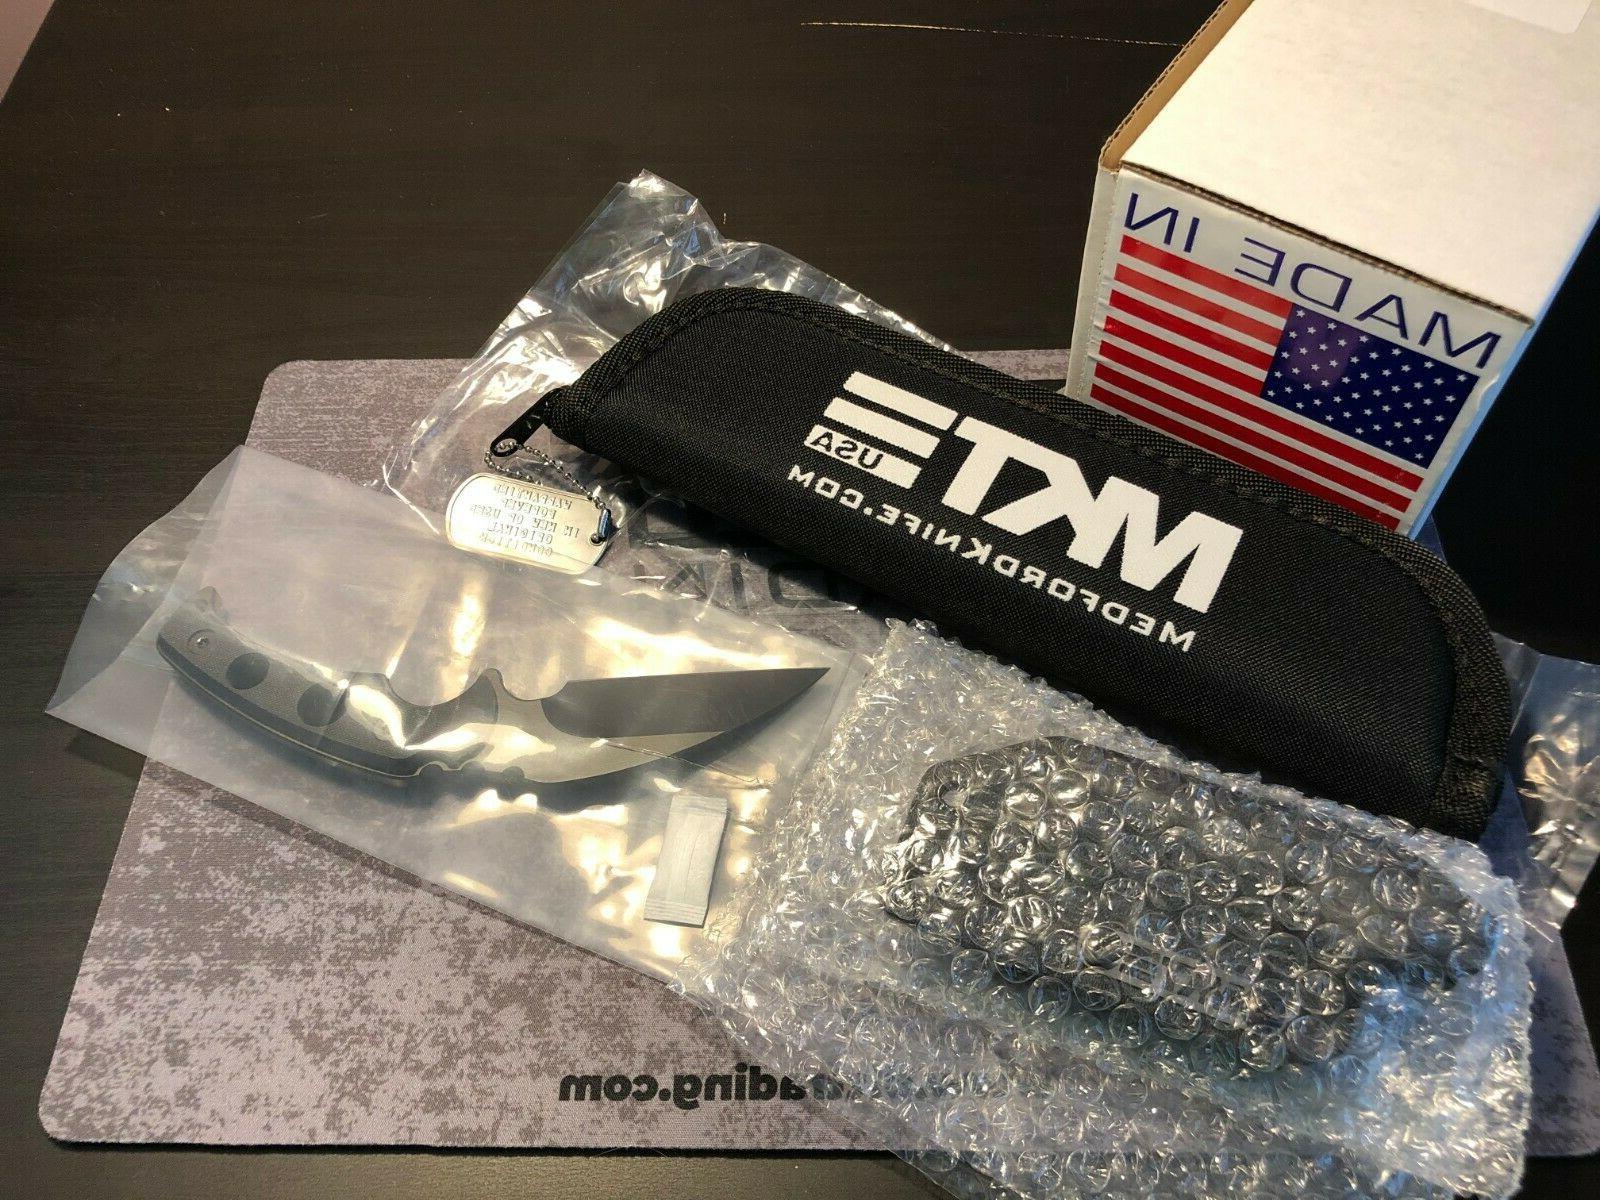 Medford Knife - Fighting Utility Knife  - PVD S35VN - Black